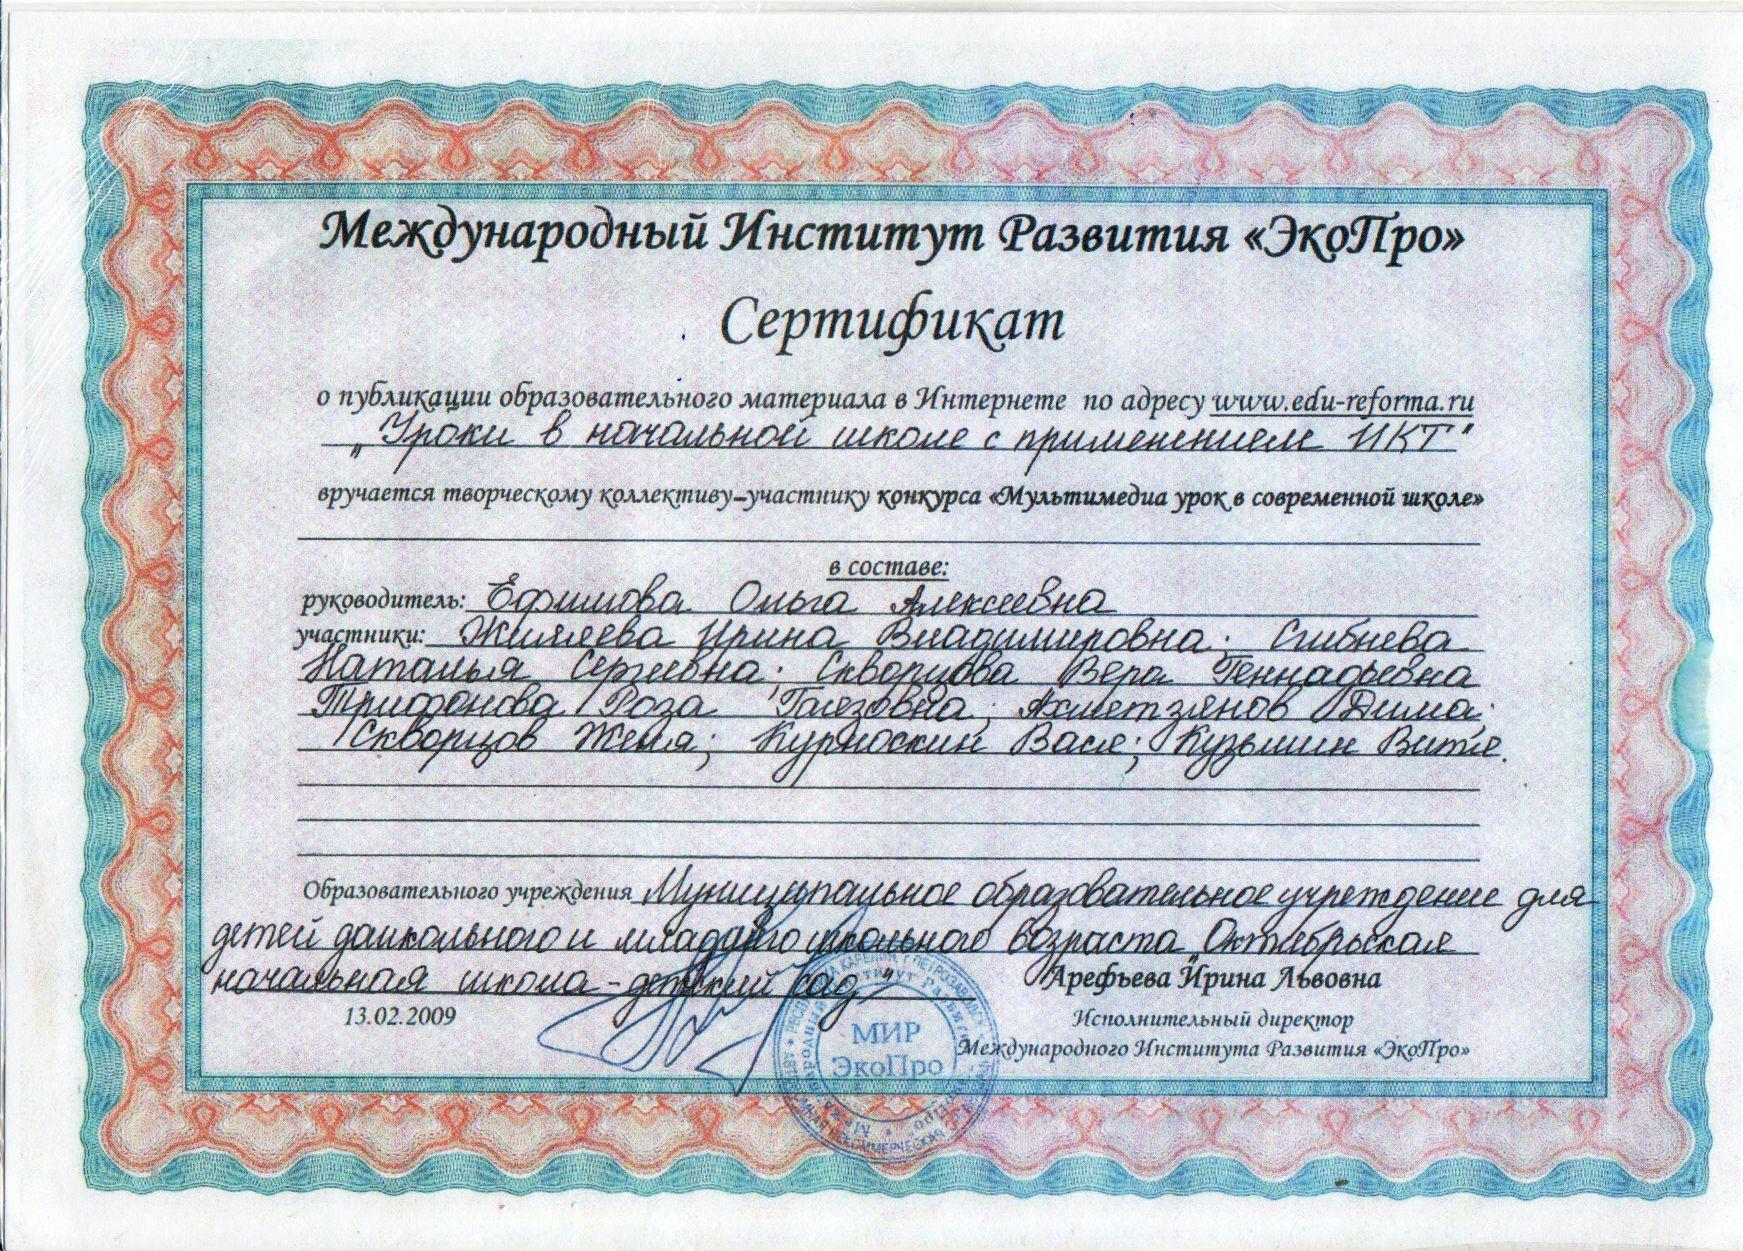 сочинение по творчеству а блока моя тема тема о росии